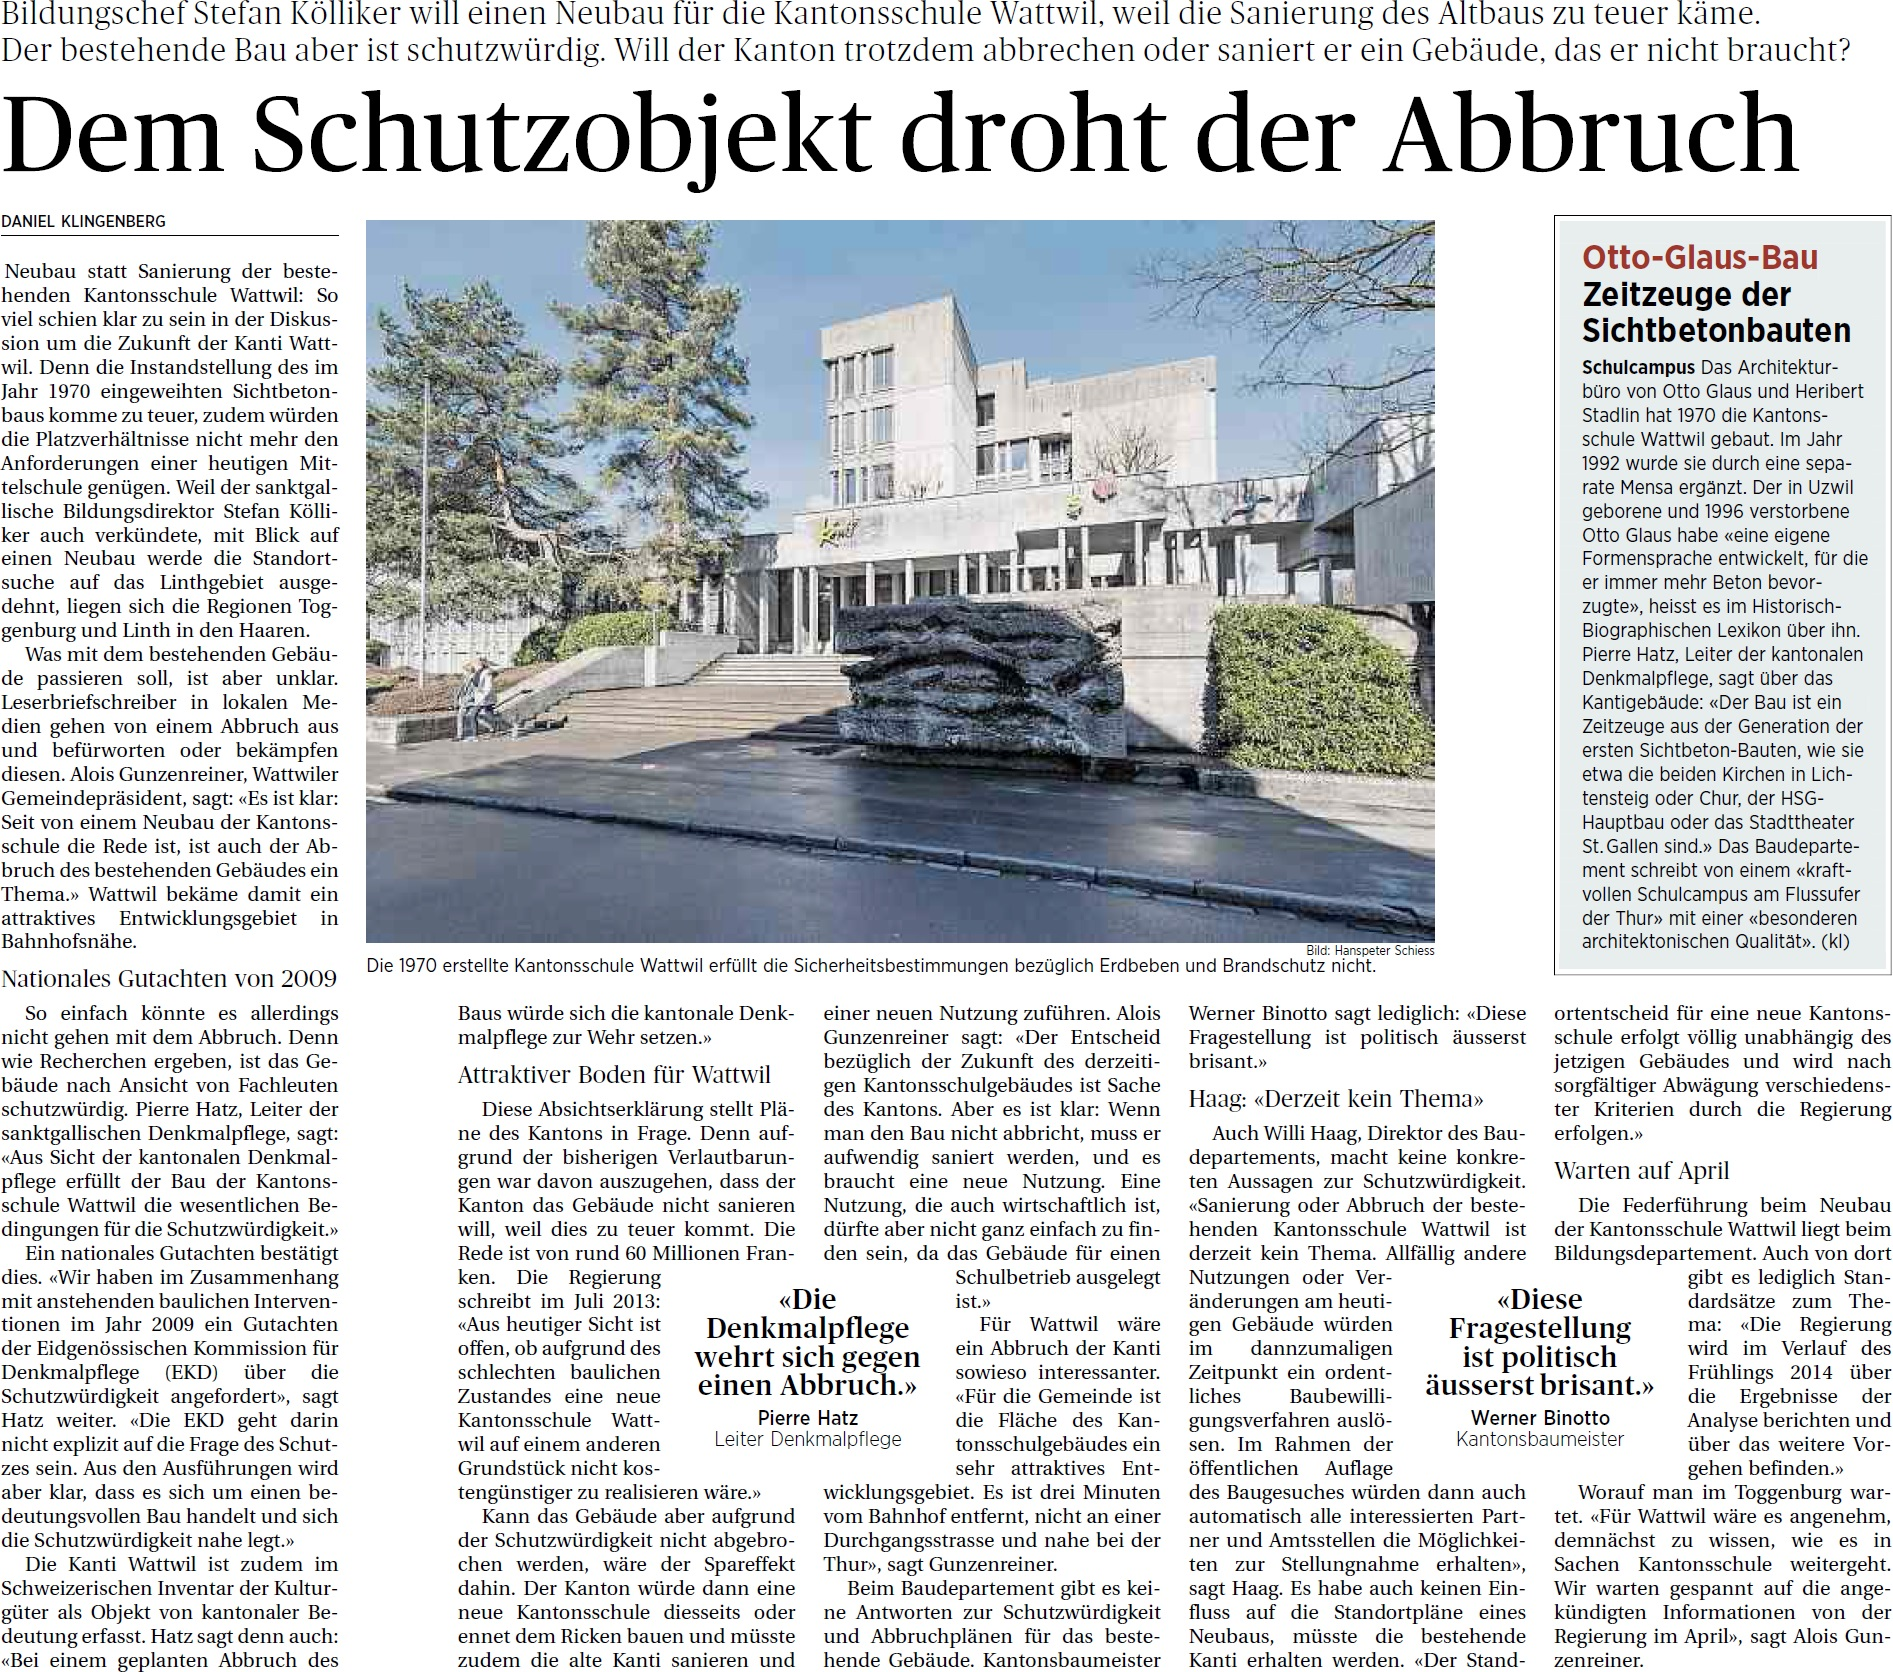 Dem Schutzobjekt droht der Abbruch (Sonntag, 30.03.2014)